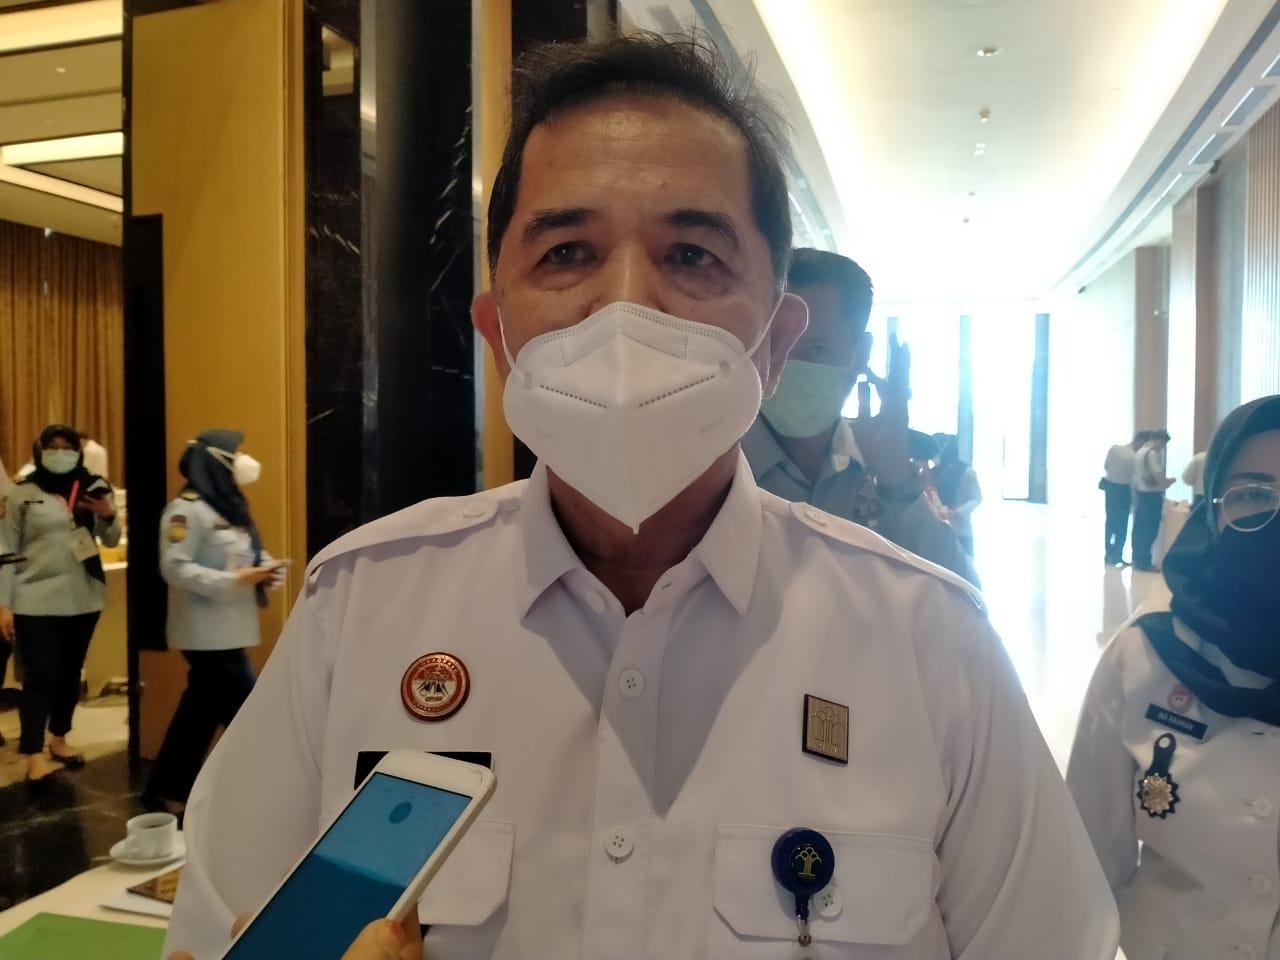 Kepala Divisi Permasyarakatan (Kadivpas) Kementerian Hukum dan HAM (Kemenkumham) Sumatera Selatan (Sumsel) Dadi Mulyadi (Reza Fajri / Mattanews.co)